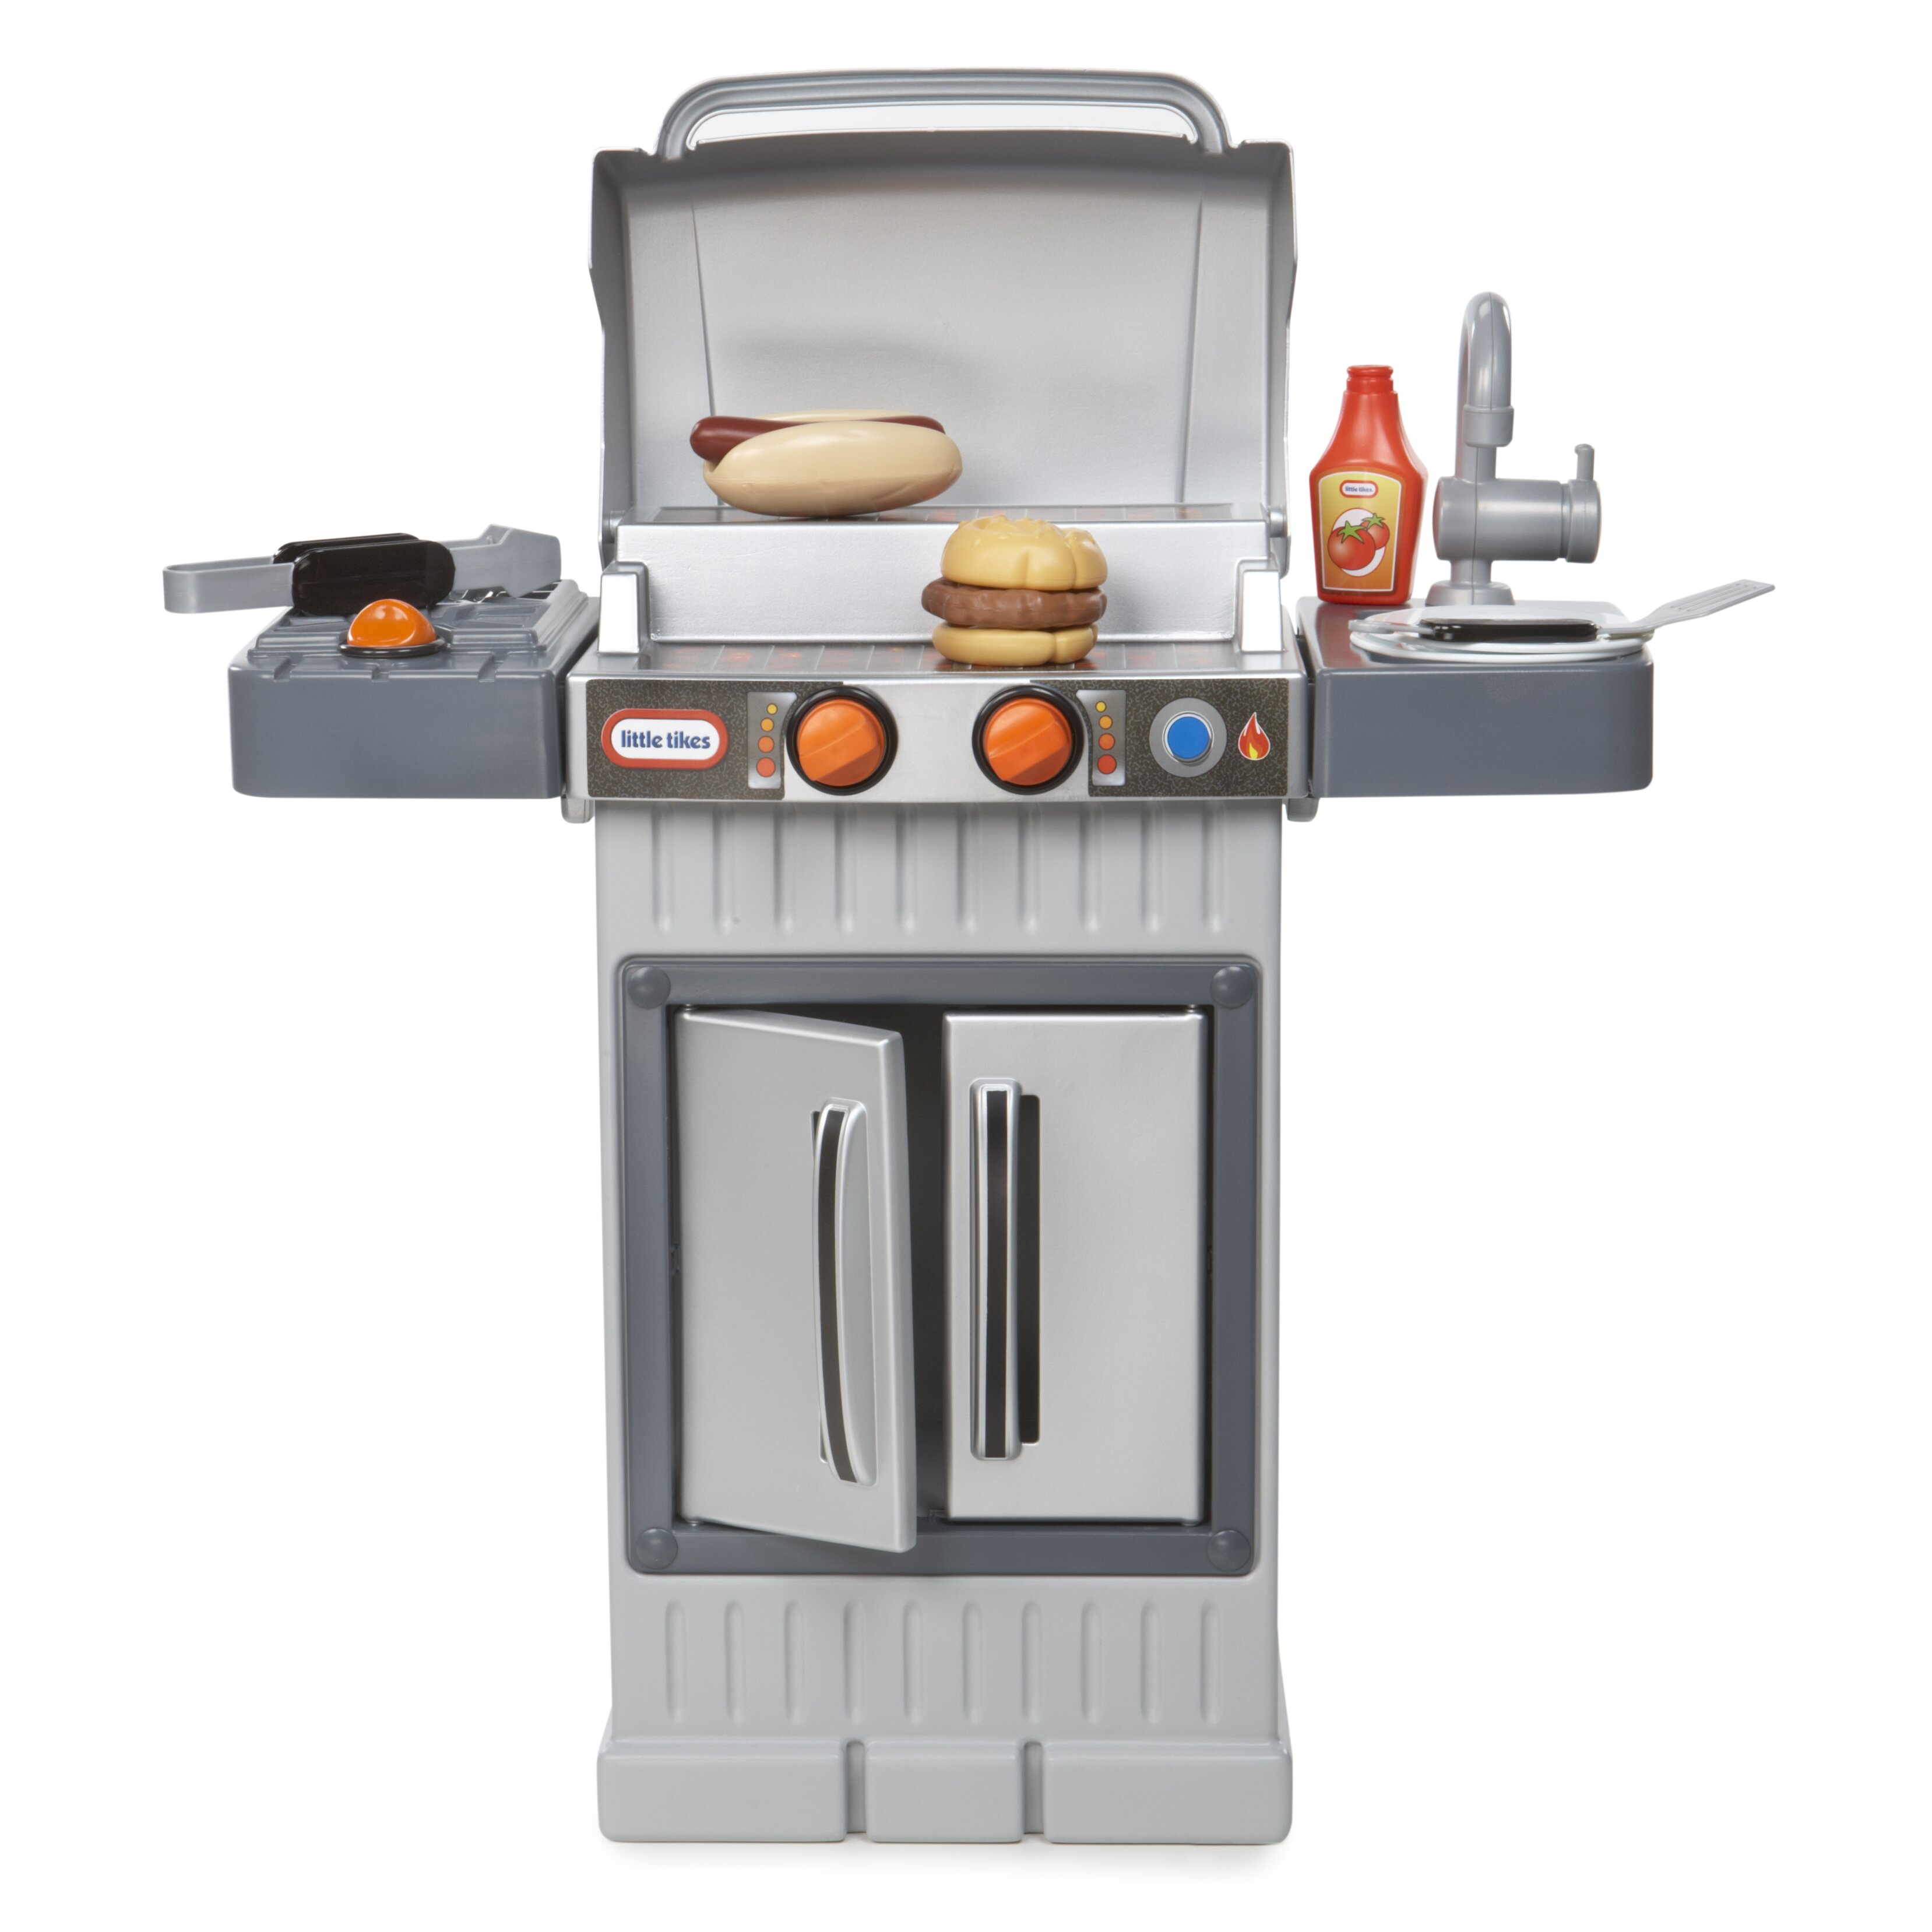 Kitchen Little: Little Tikes Cook 'n Grow™ BBQ Grill Kitchen Set & Reviews